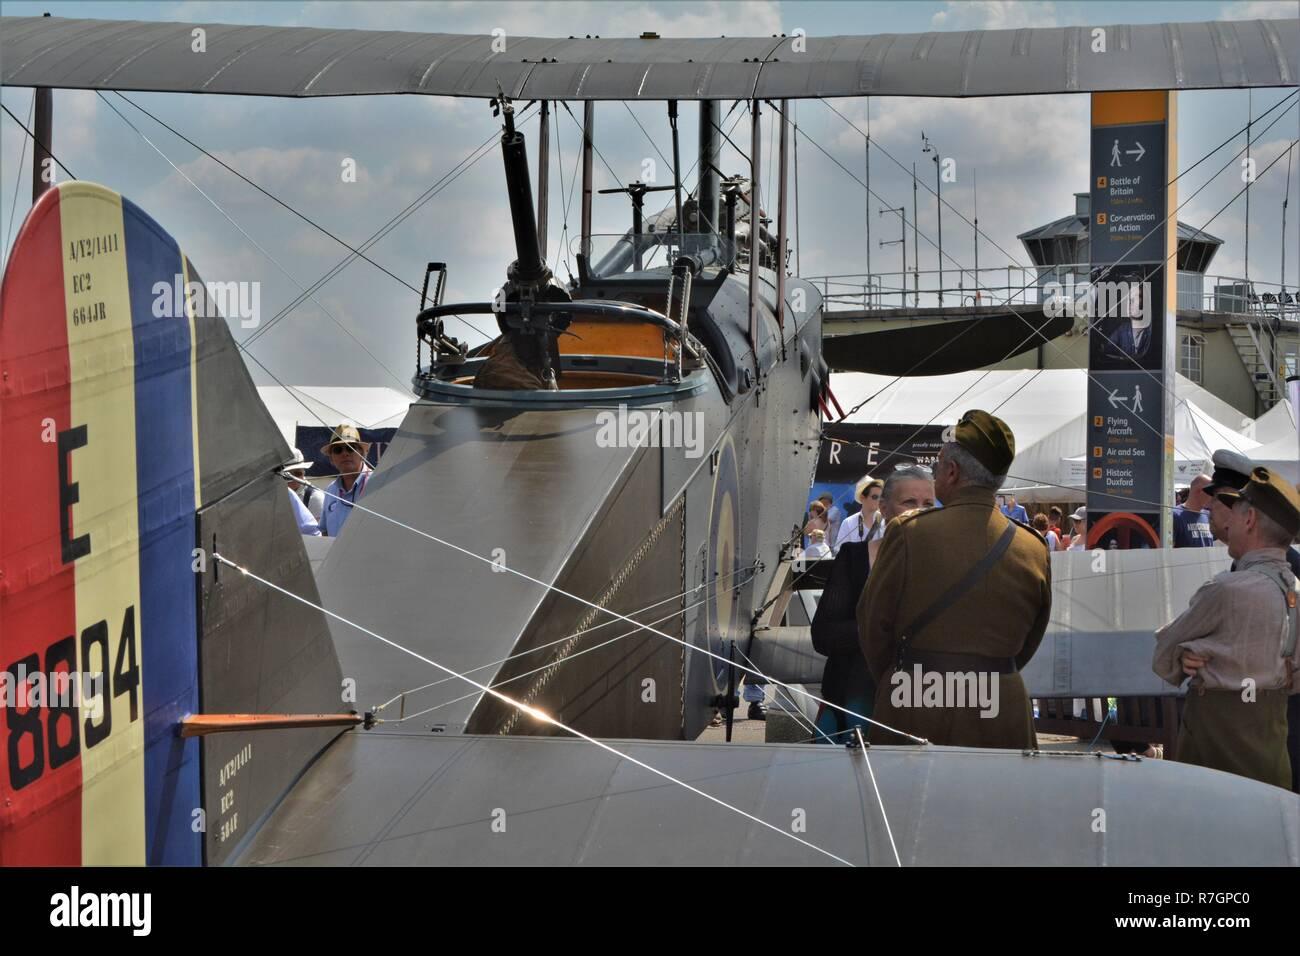 Airco DH 9 first world war bi plane airplane, static display. - Stock Image